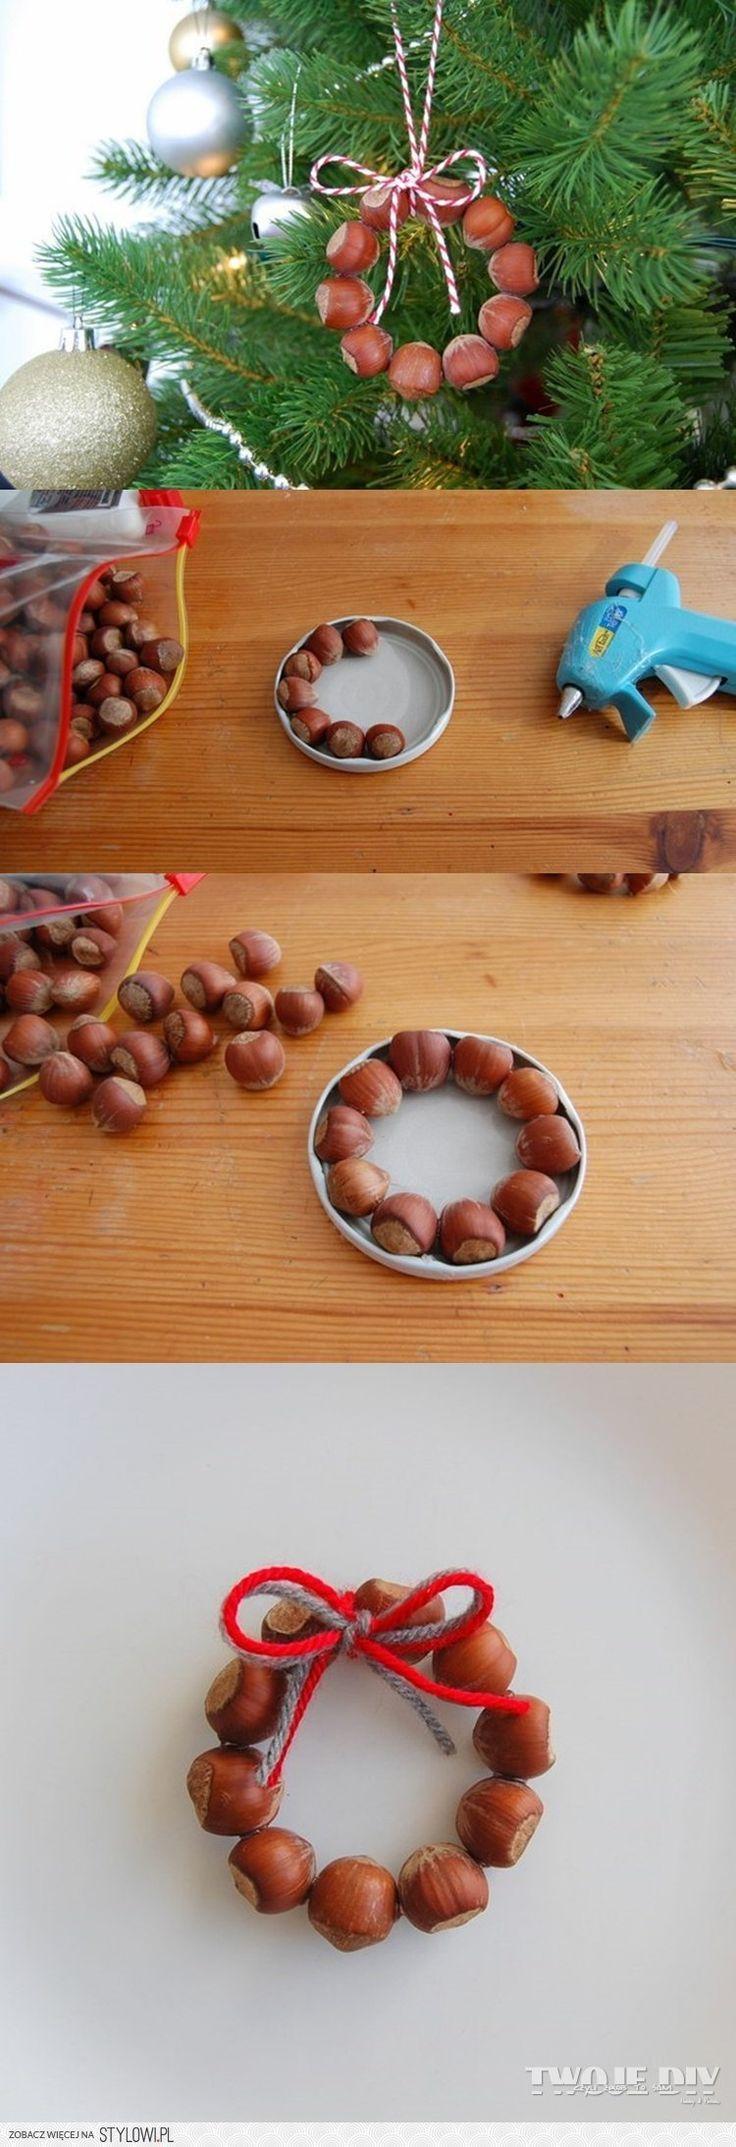 Hazelnut Wreaths #holiday #Christmas #crafts